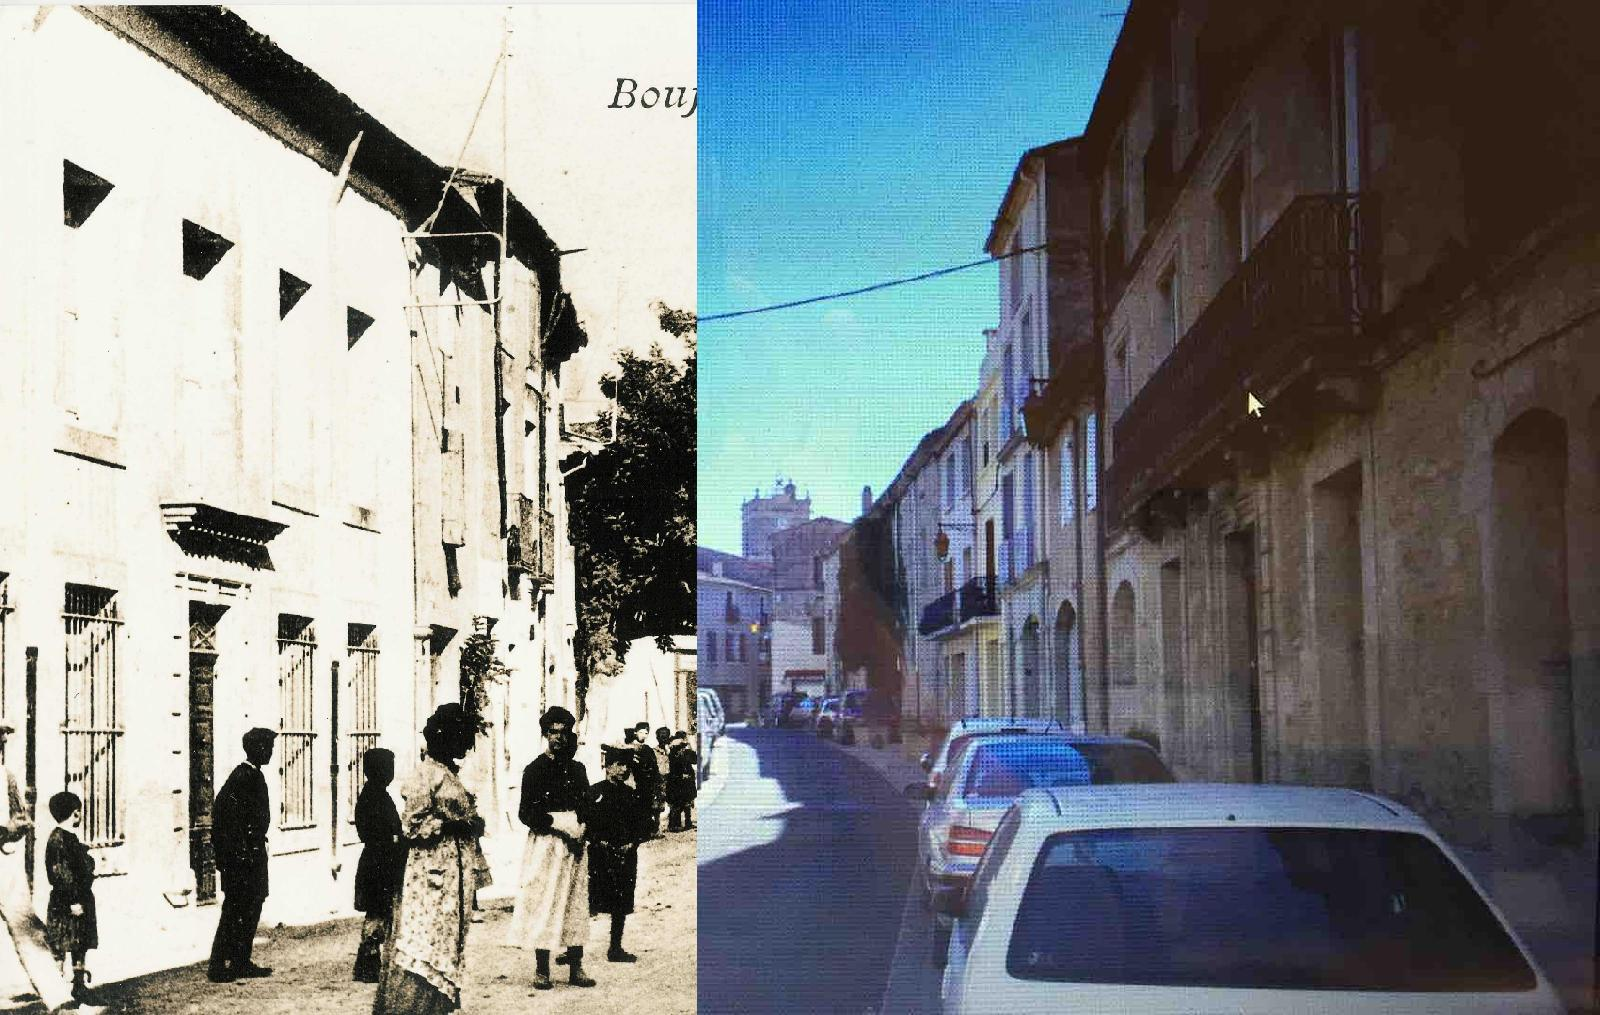 Boujan-sur-Libron - La Grand'Rue